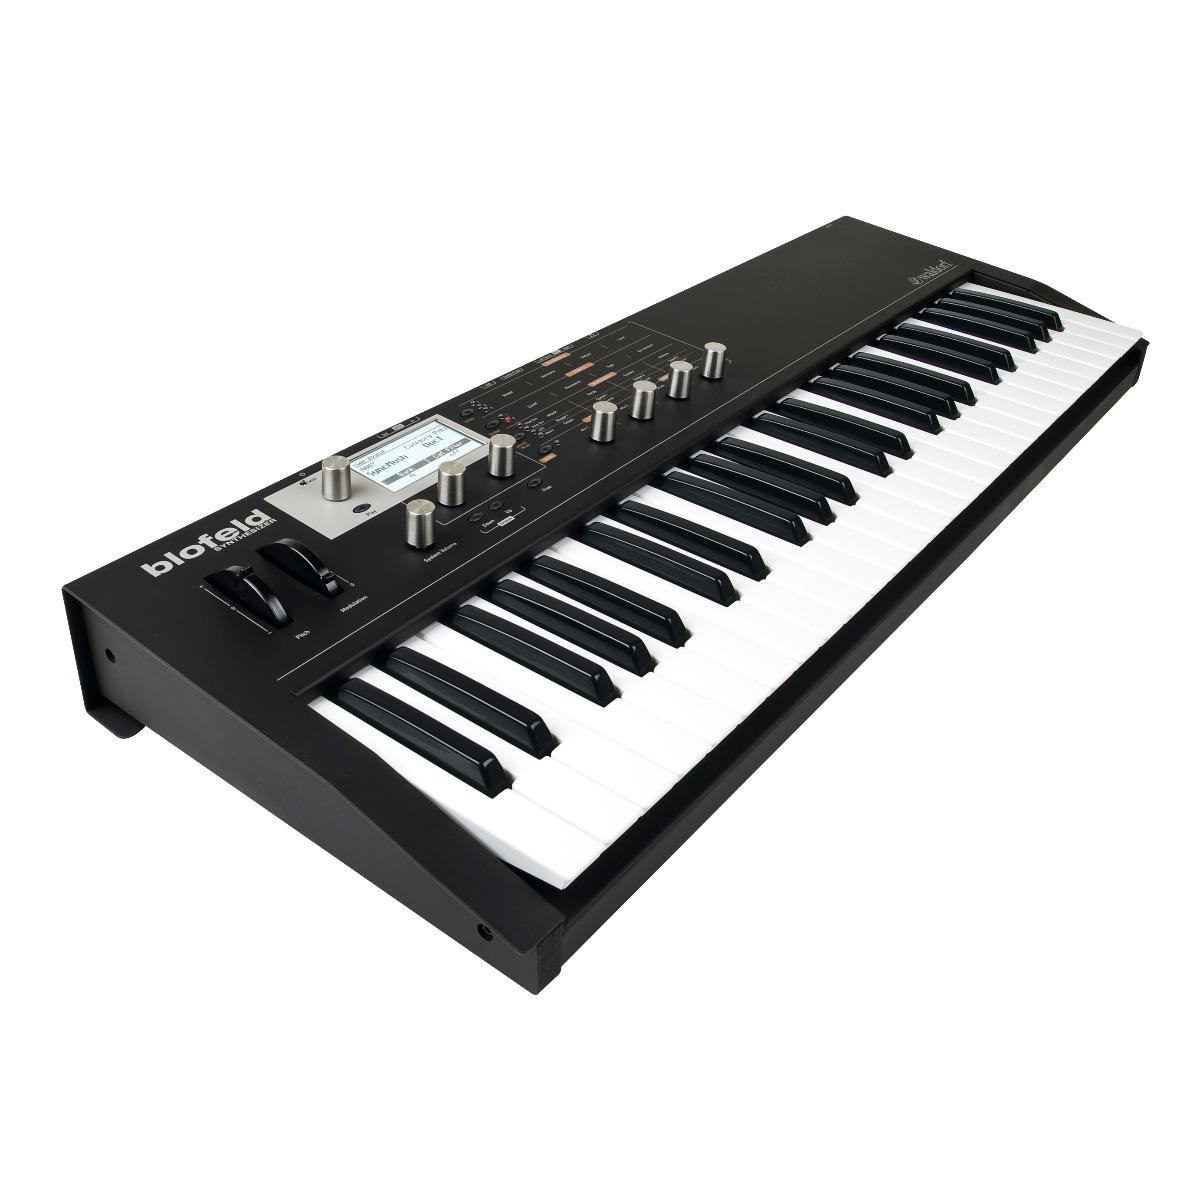 Waldorf Blofeld Keyboard black 226177